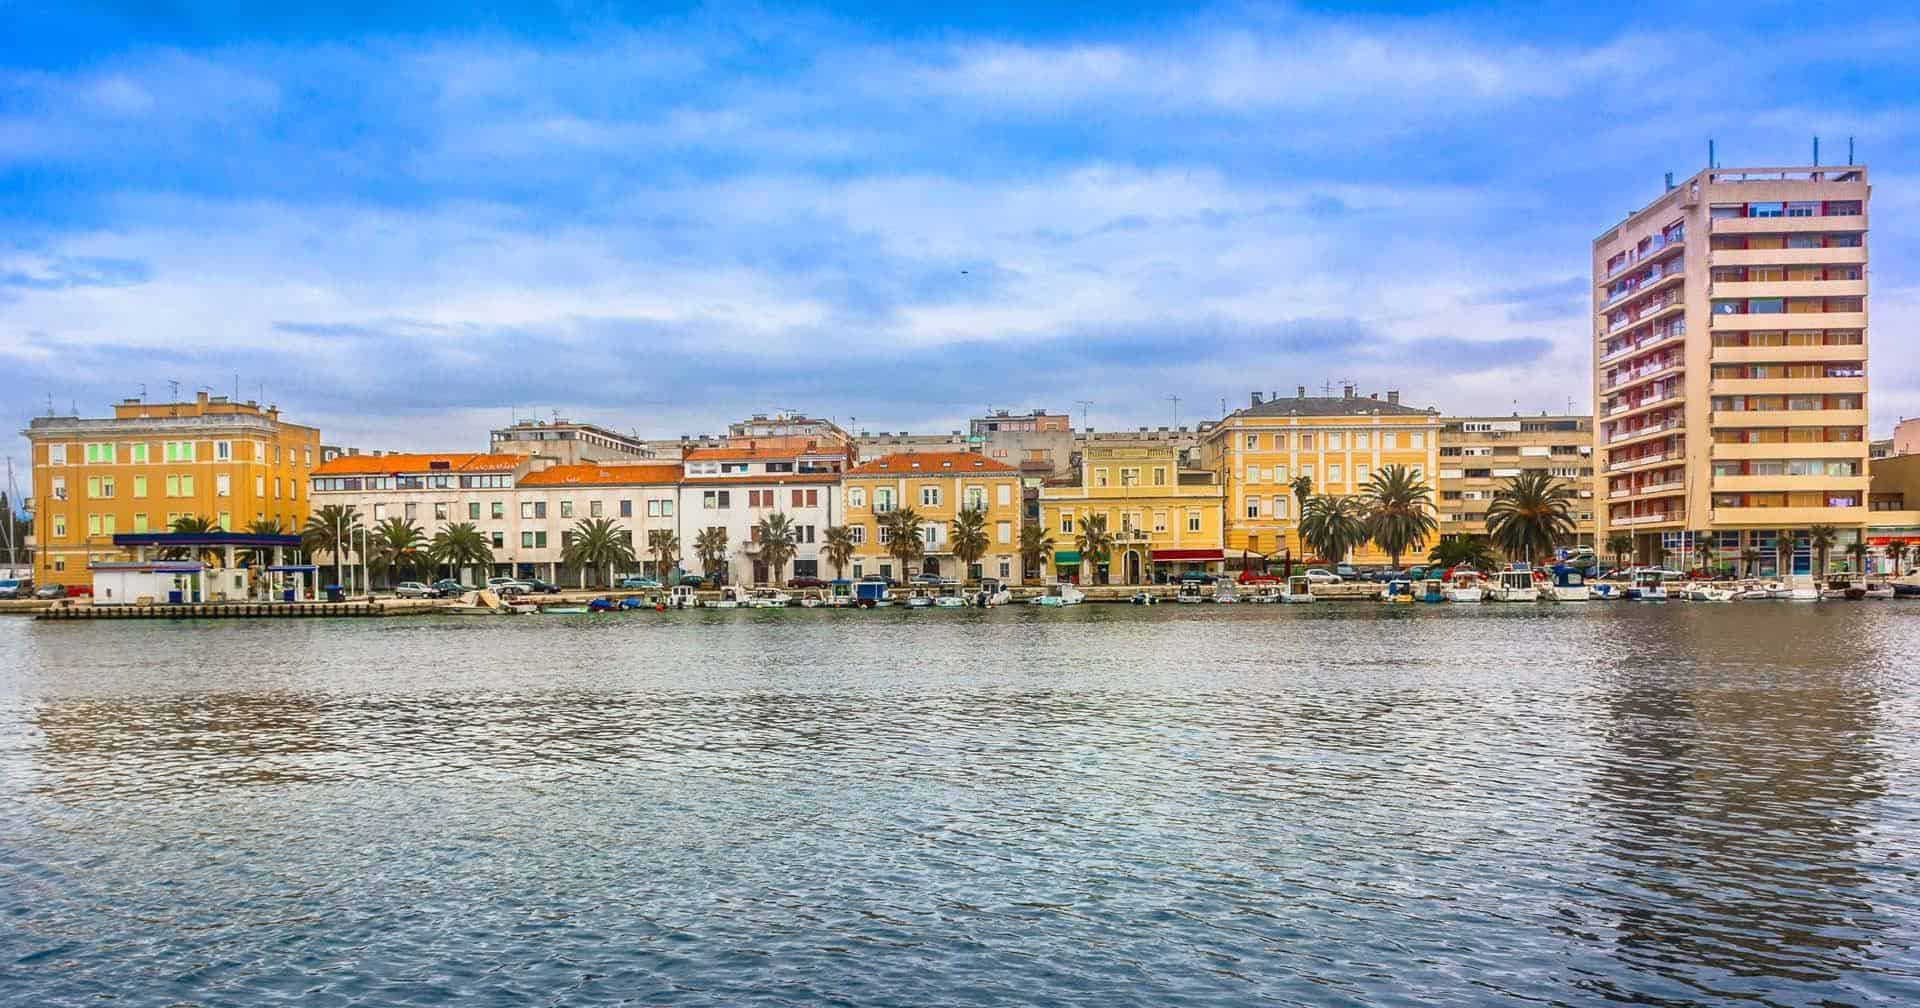 Top 10 Awesome Things to do in Zadar (Croatia)